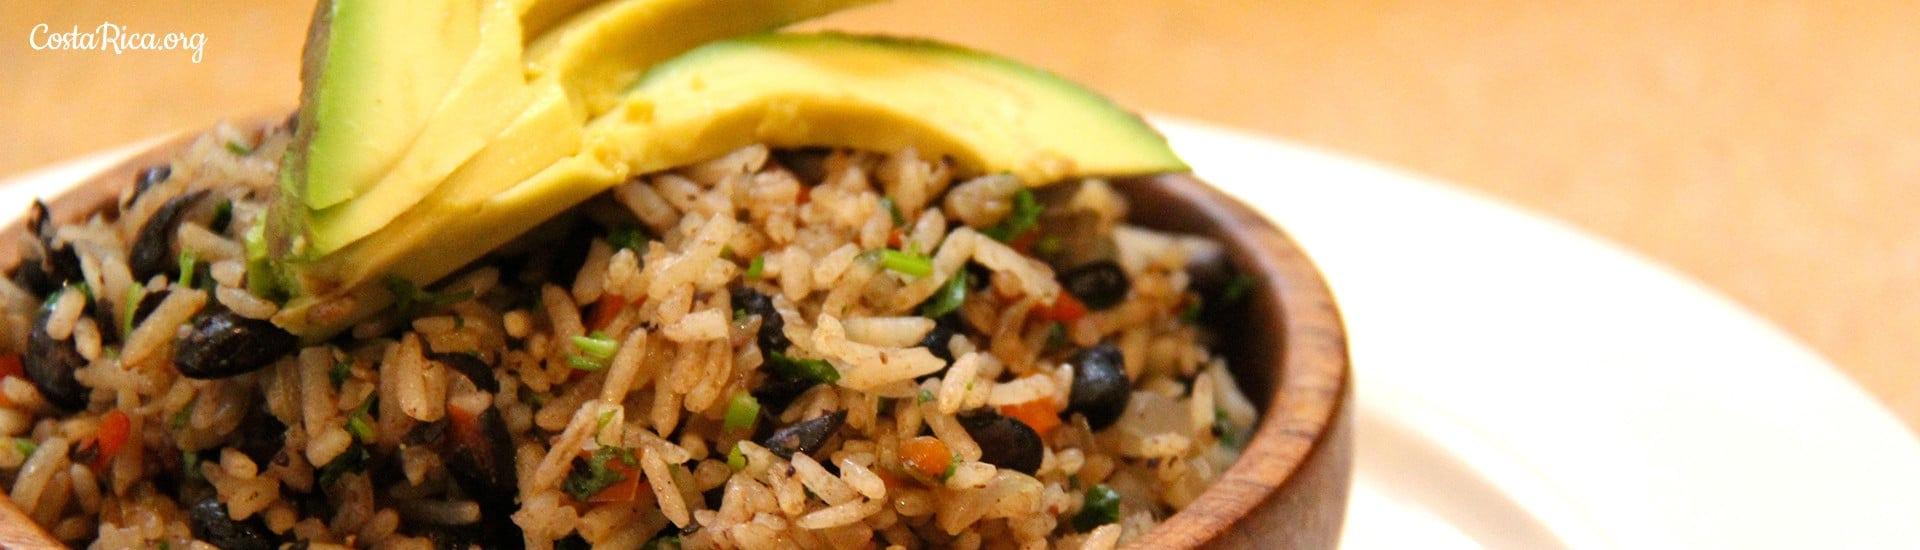 Costa Rican Food Recipes Easy